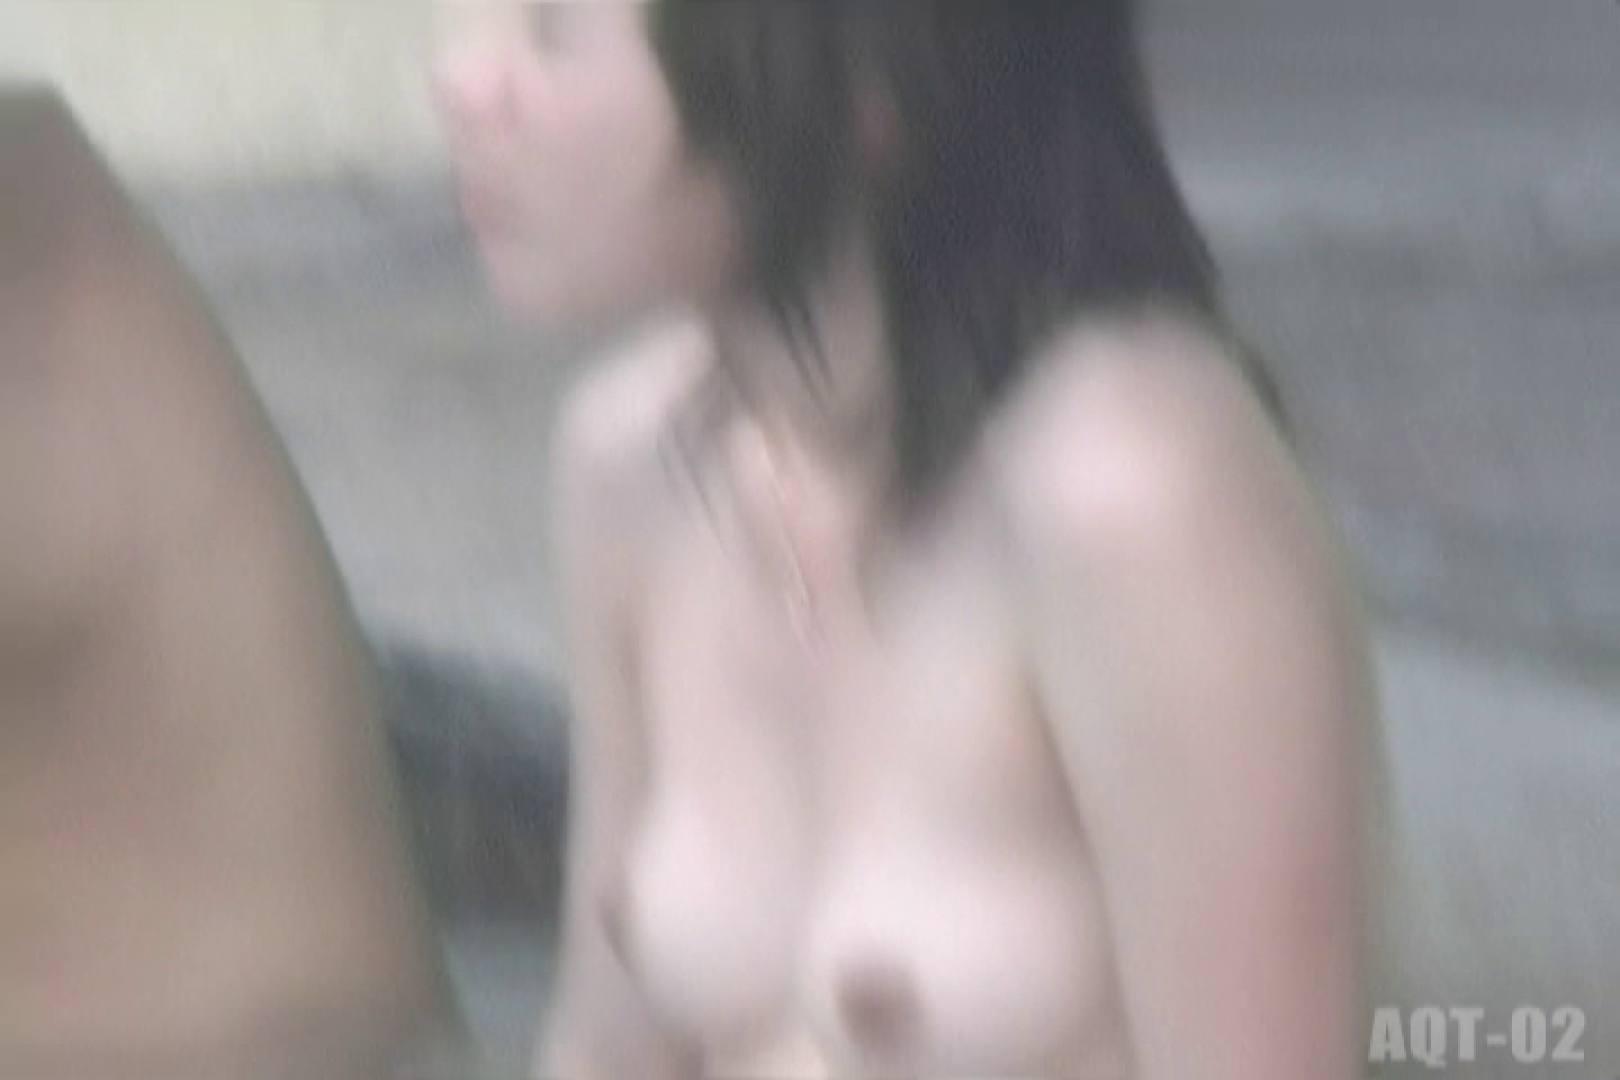 女露天風呂劇場 Vol.39 丸見え  64画像 42